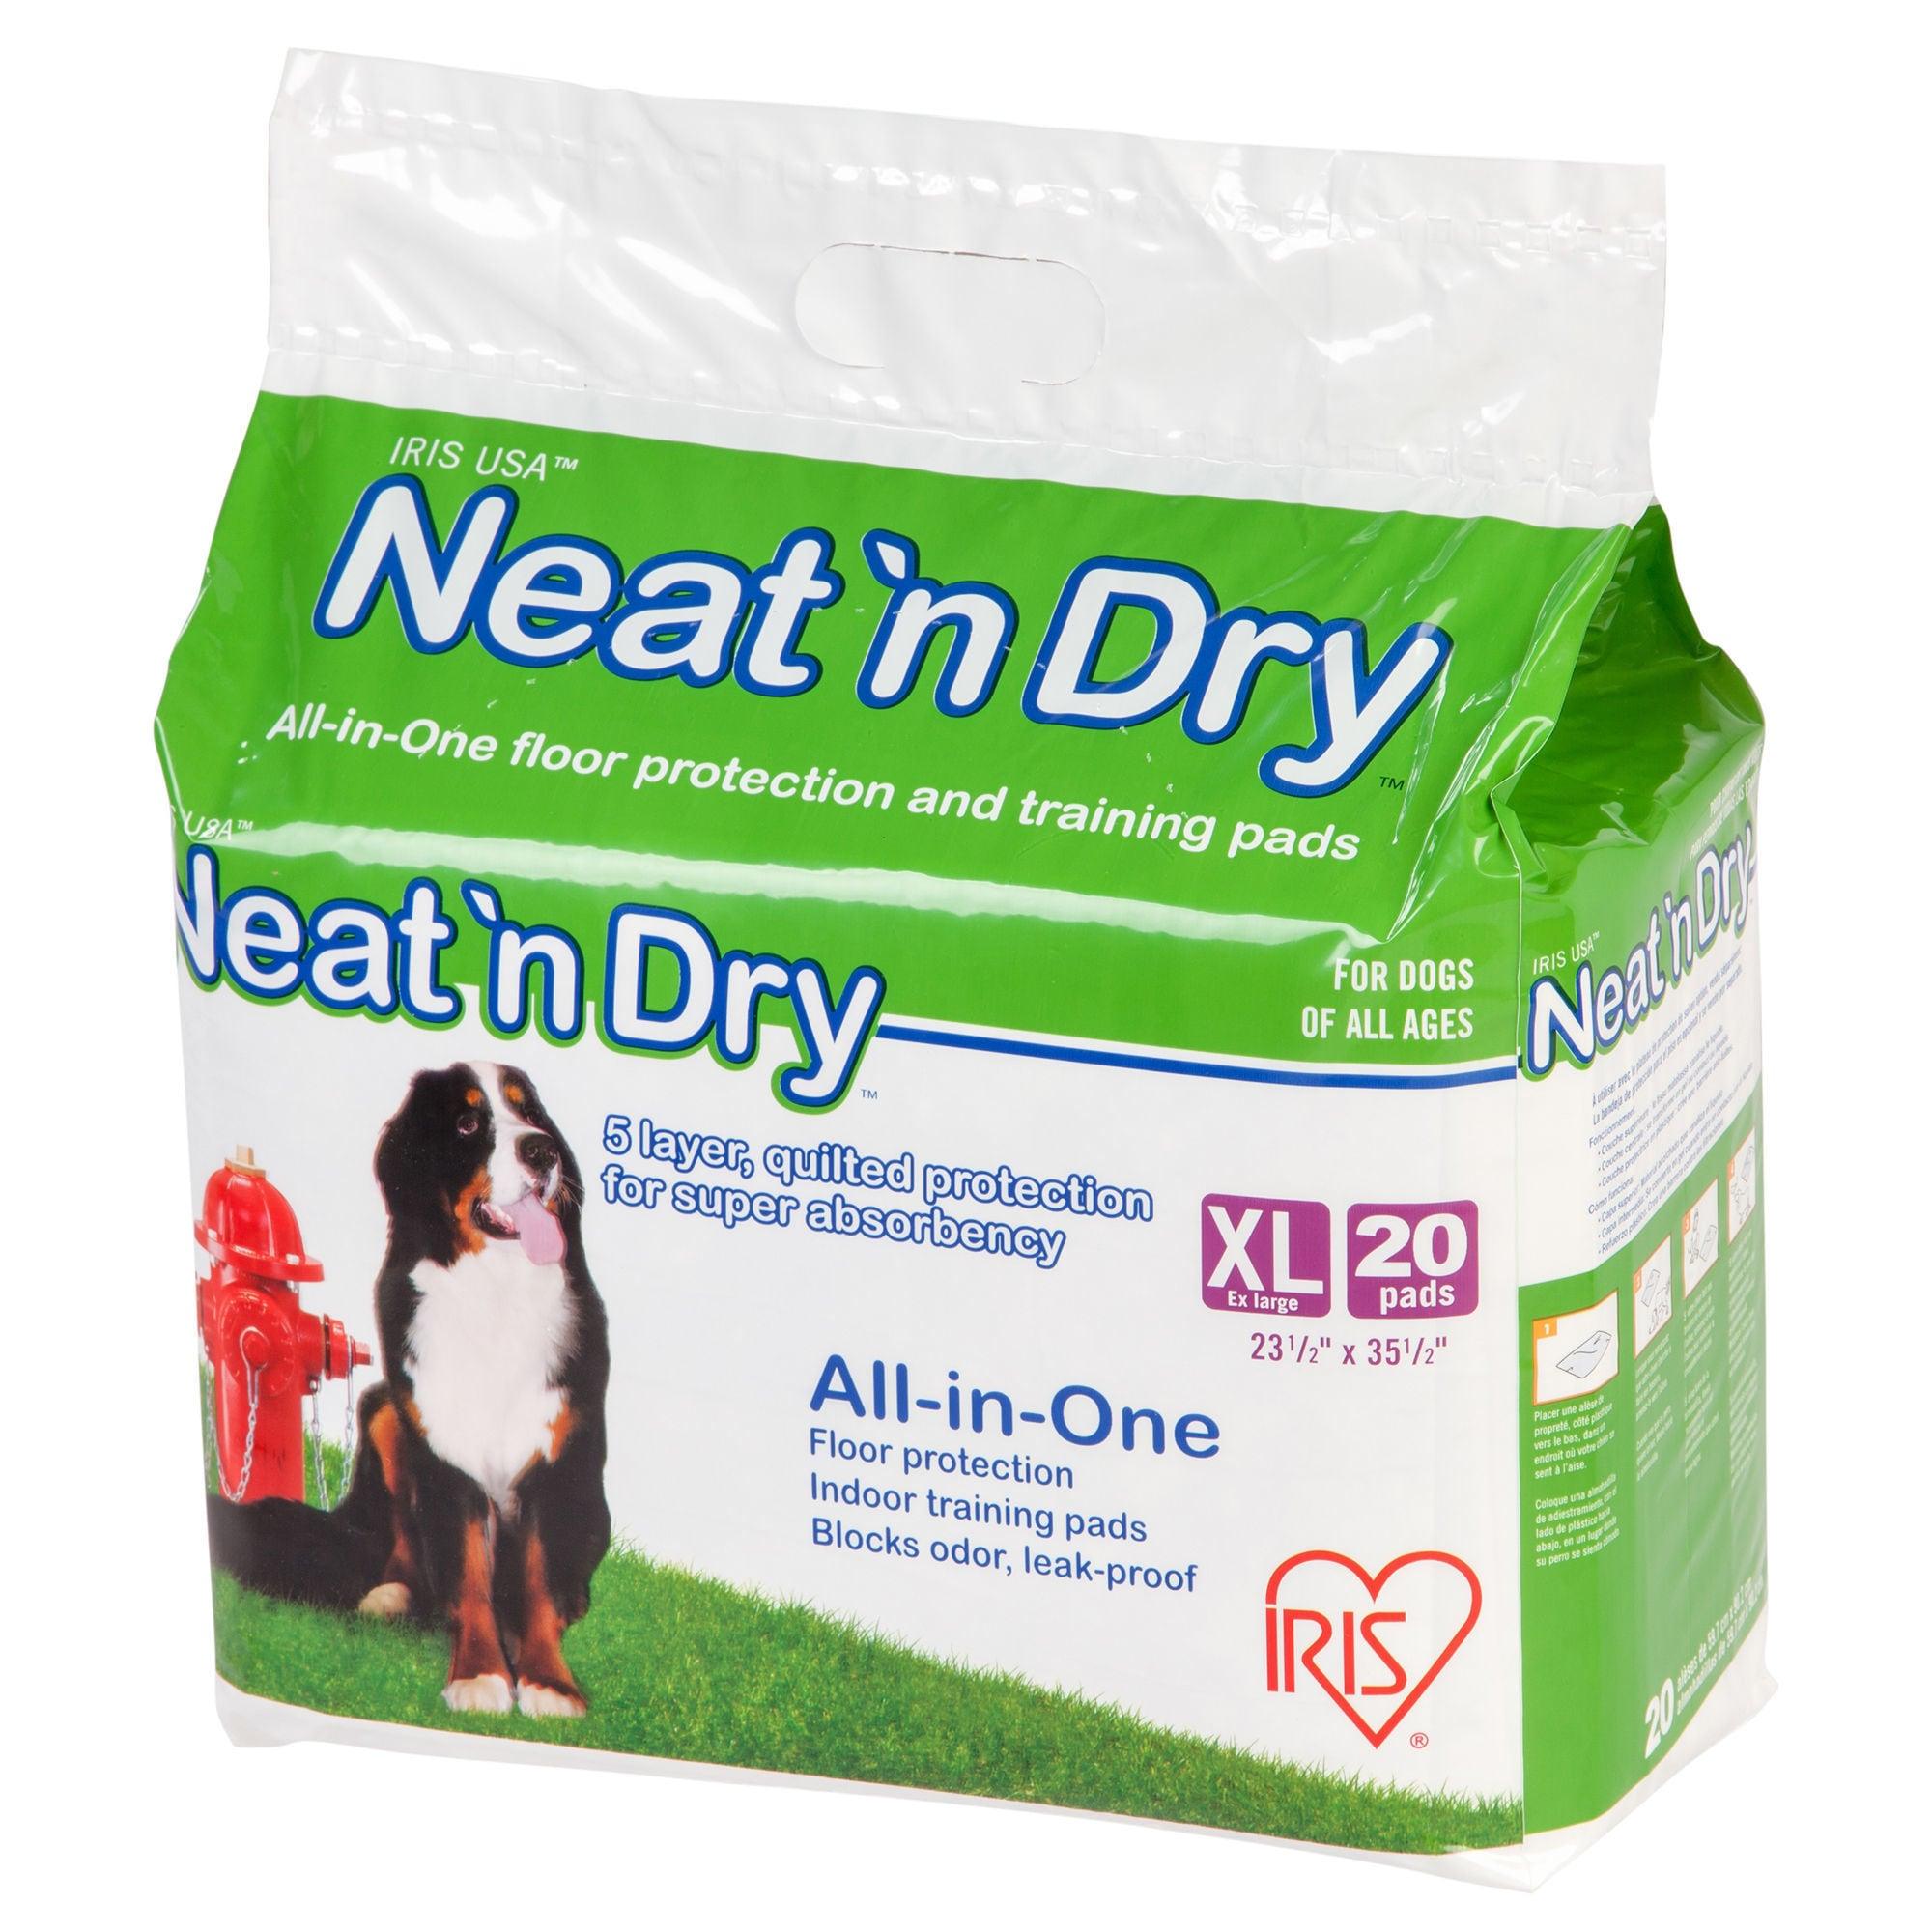 IRIS Neat 'n Dry Premium Extra Large Pet Training Pads (S...